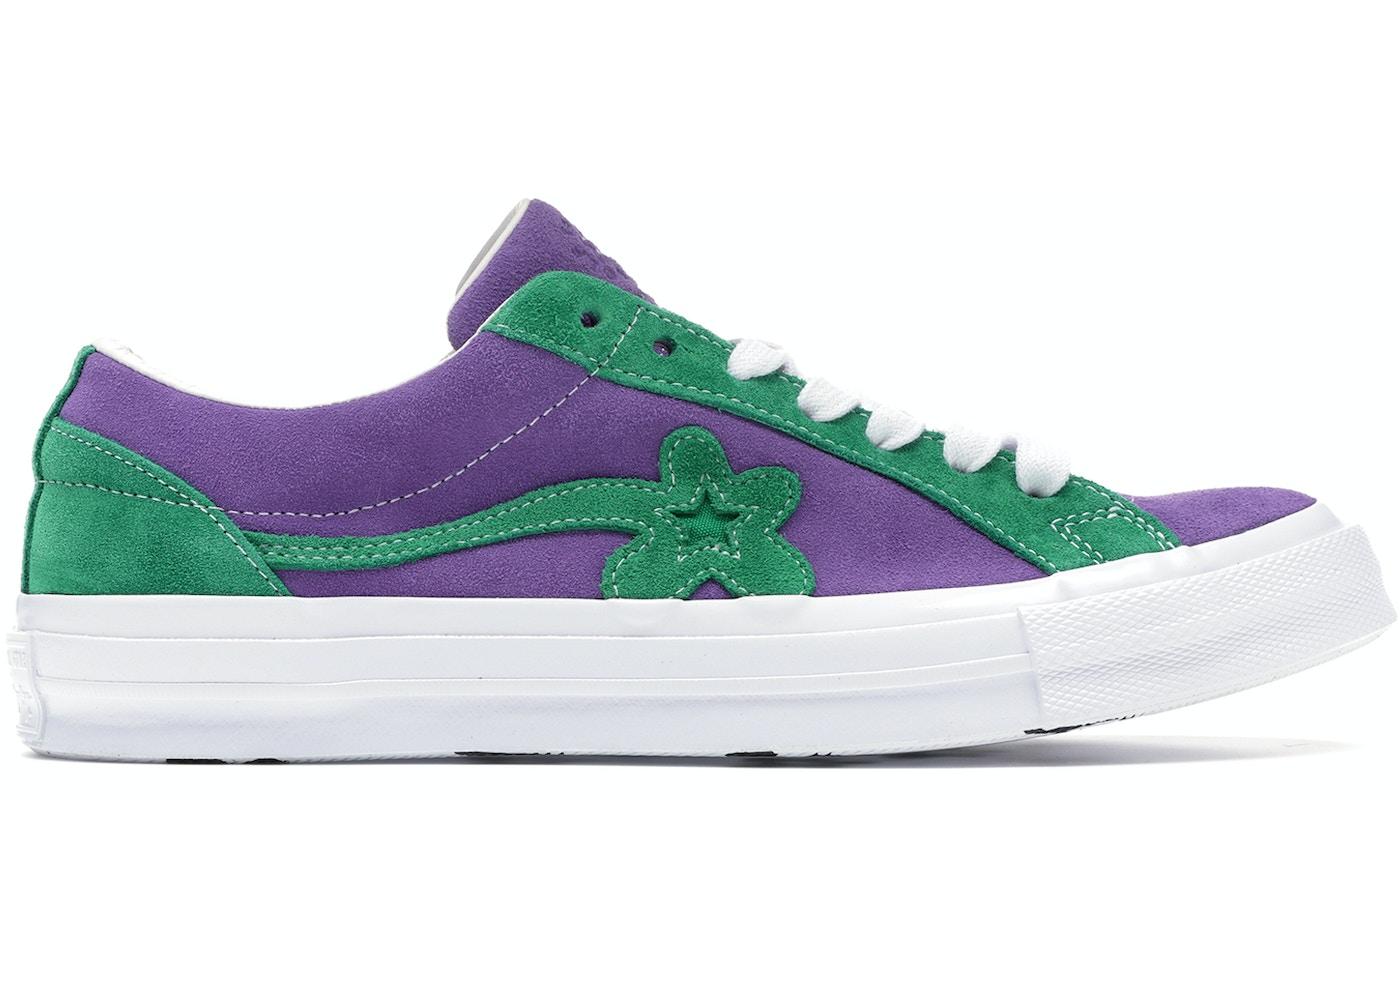 8b360abed192ea Size 5 Footwear - New Highest Bids